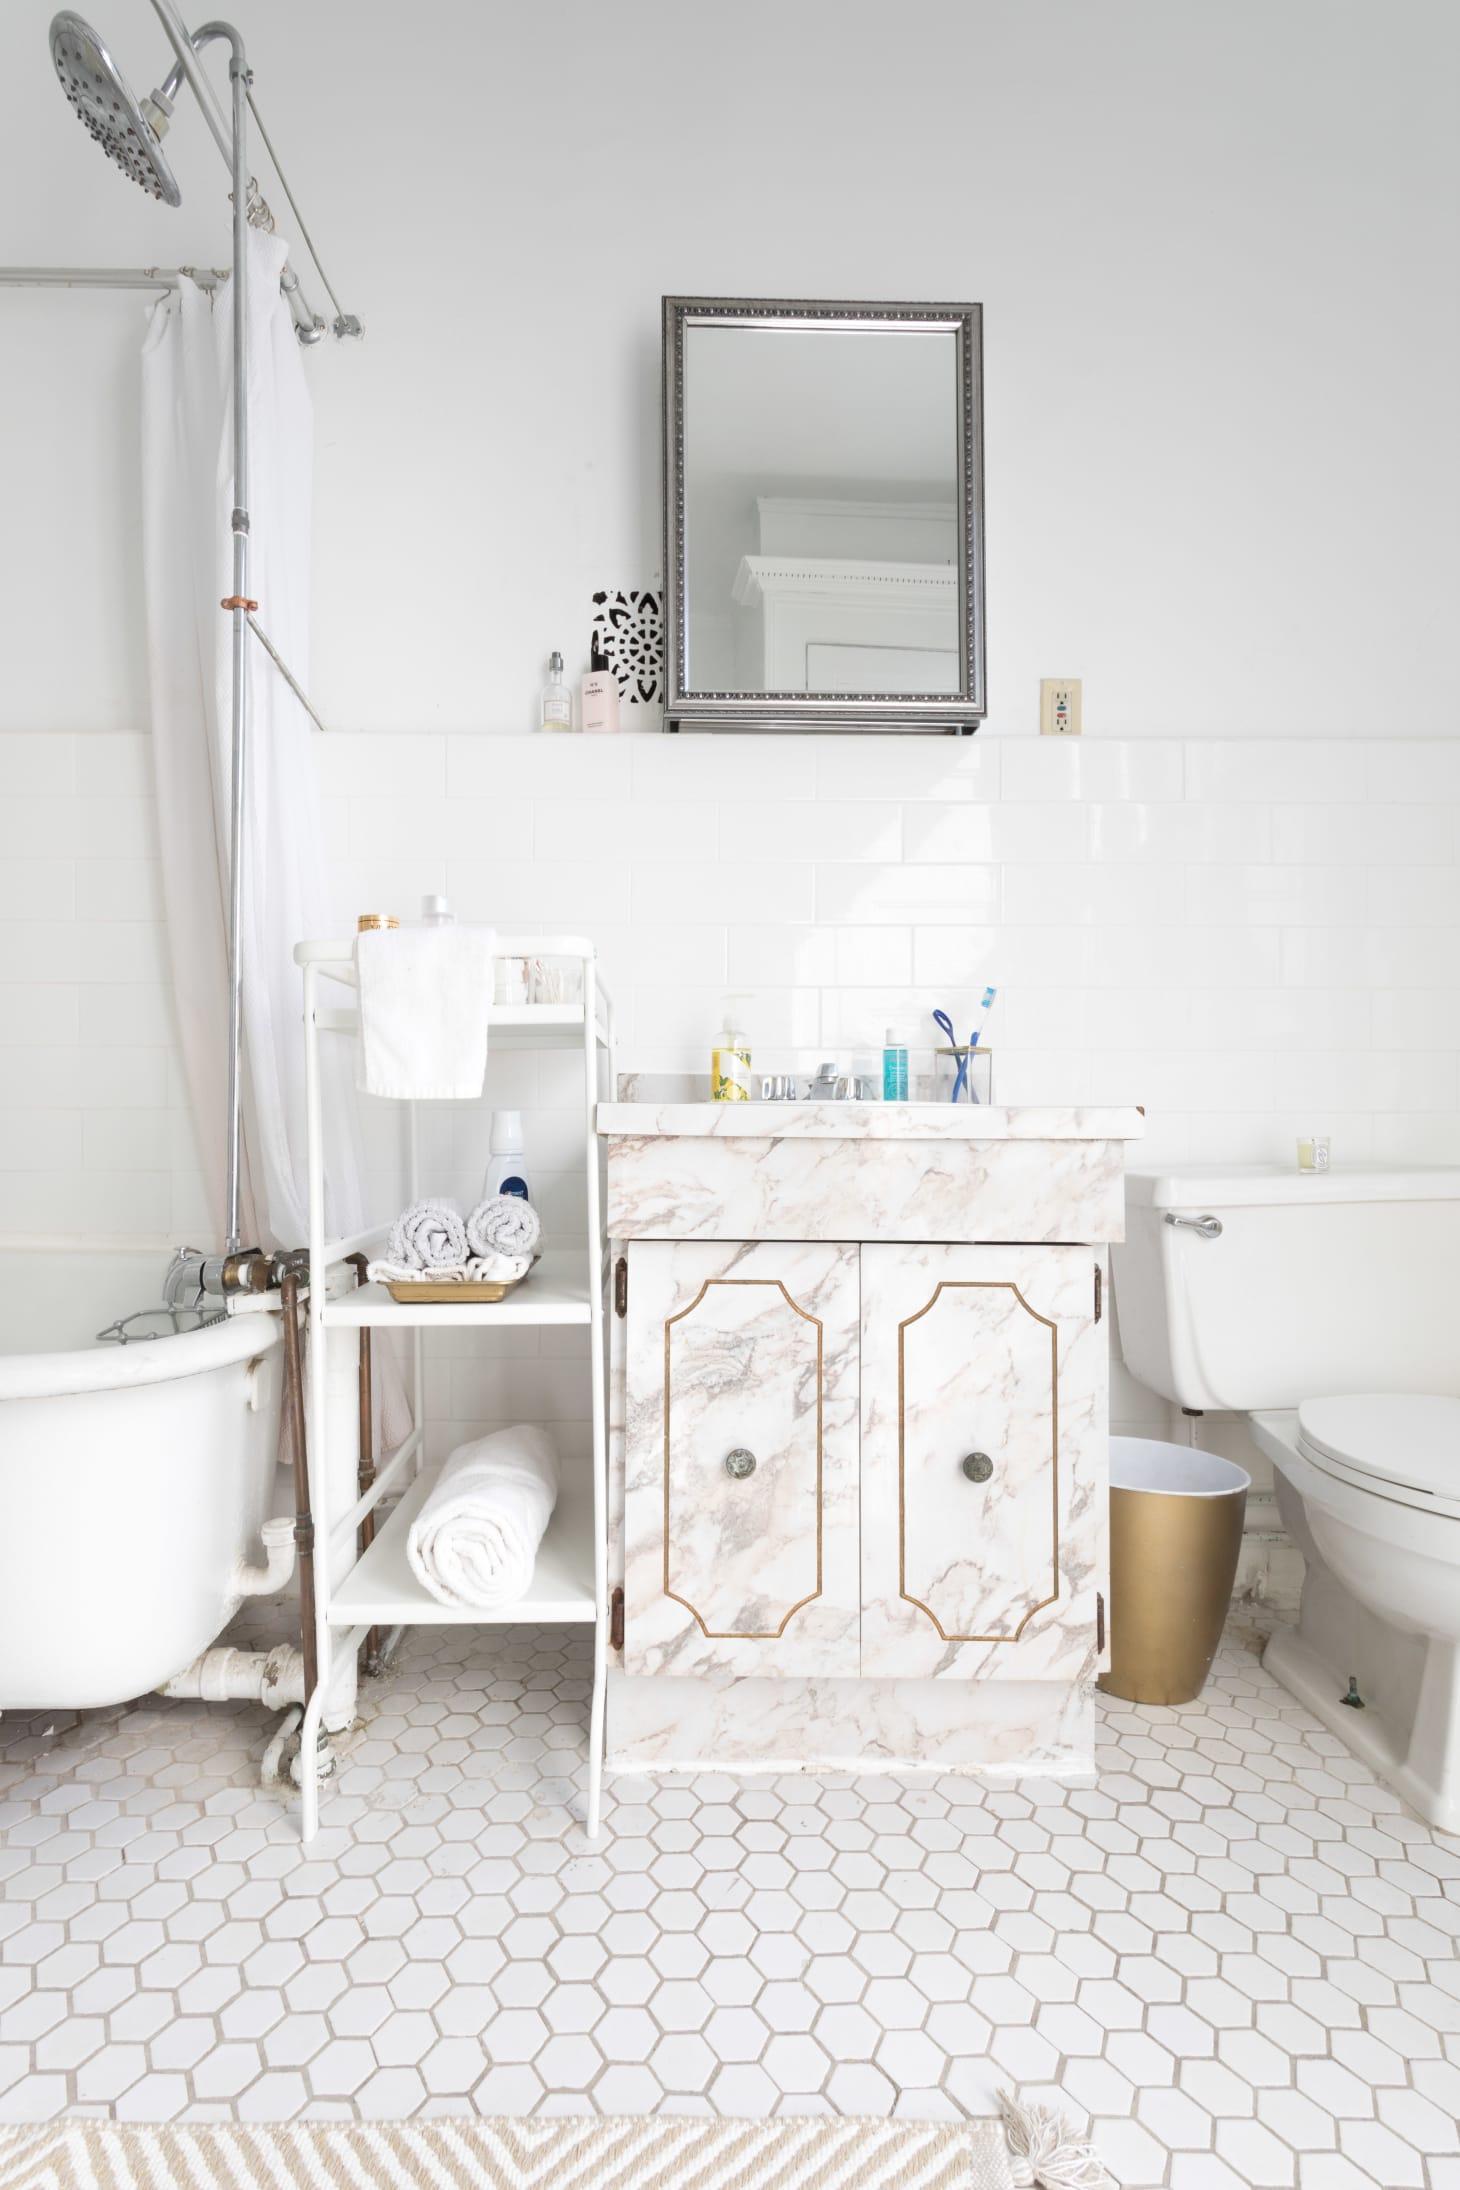 25 Small Bathroom Storage & Design Ideas - Storage ...